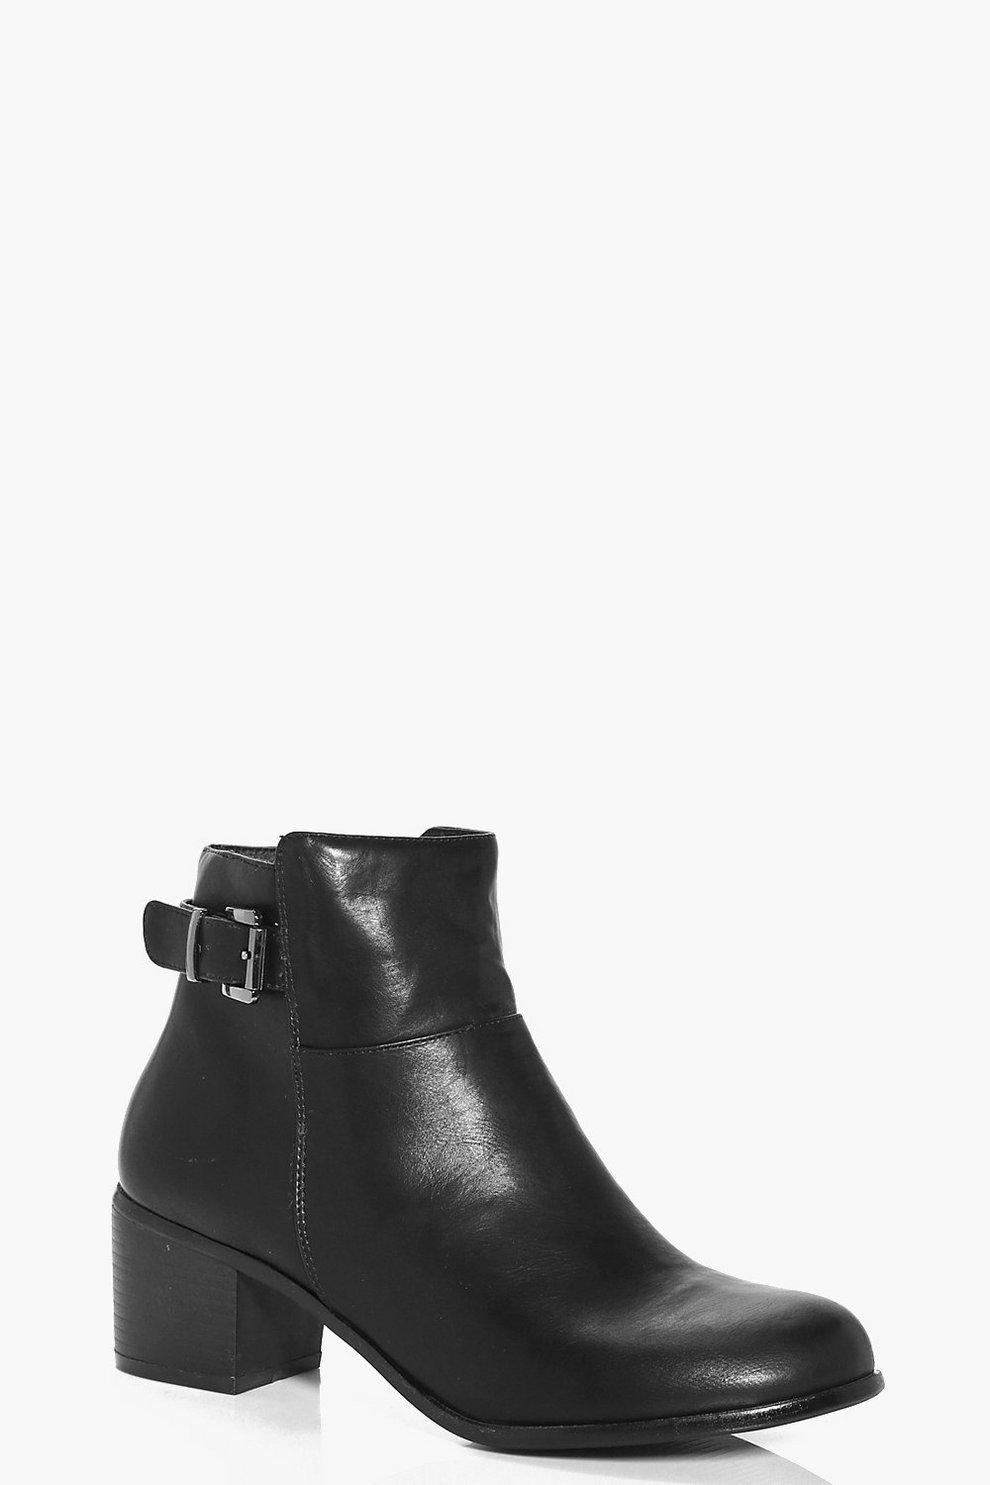 63348e9bf67 Kara Buckle Trim Ankle Boot   Boohoo